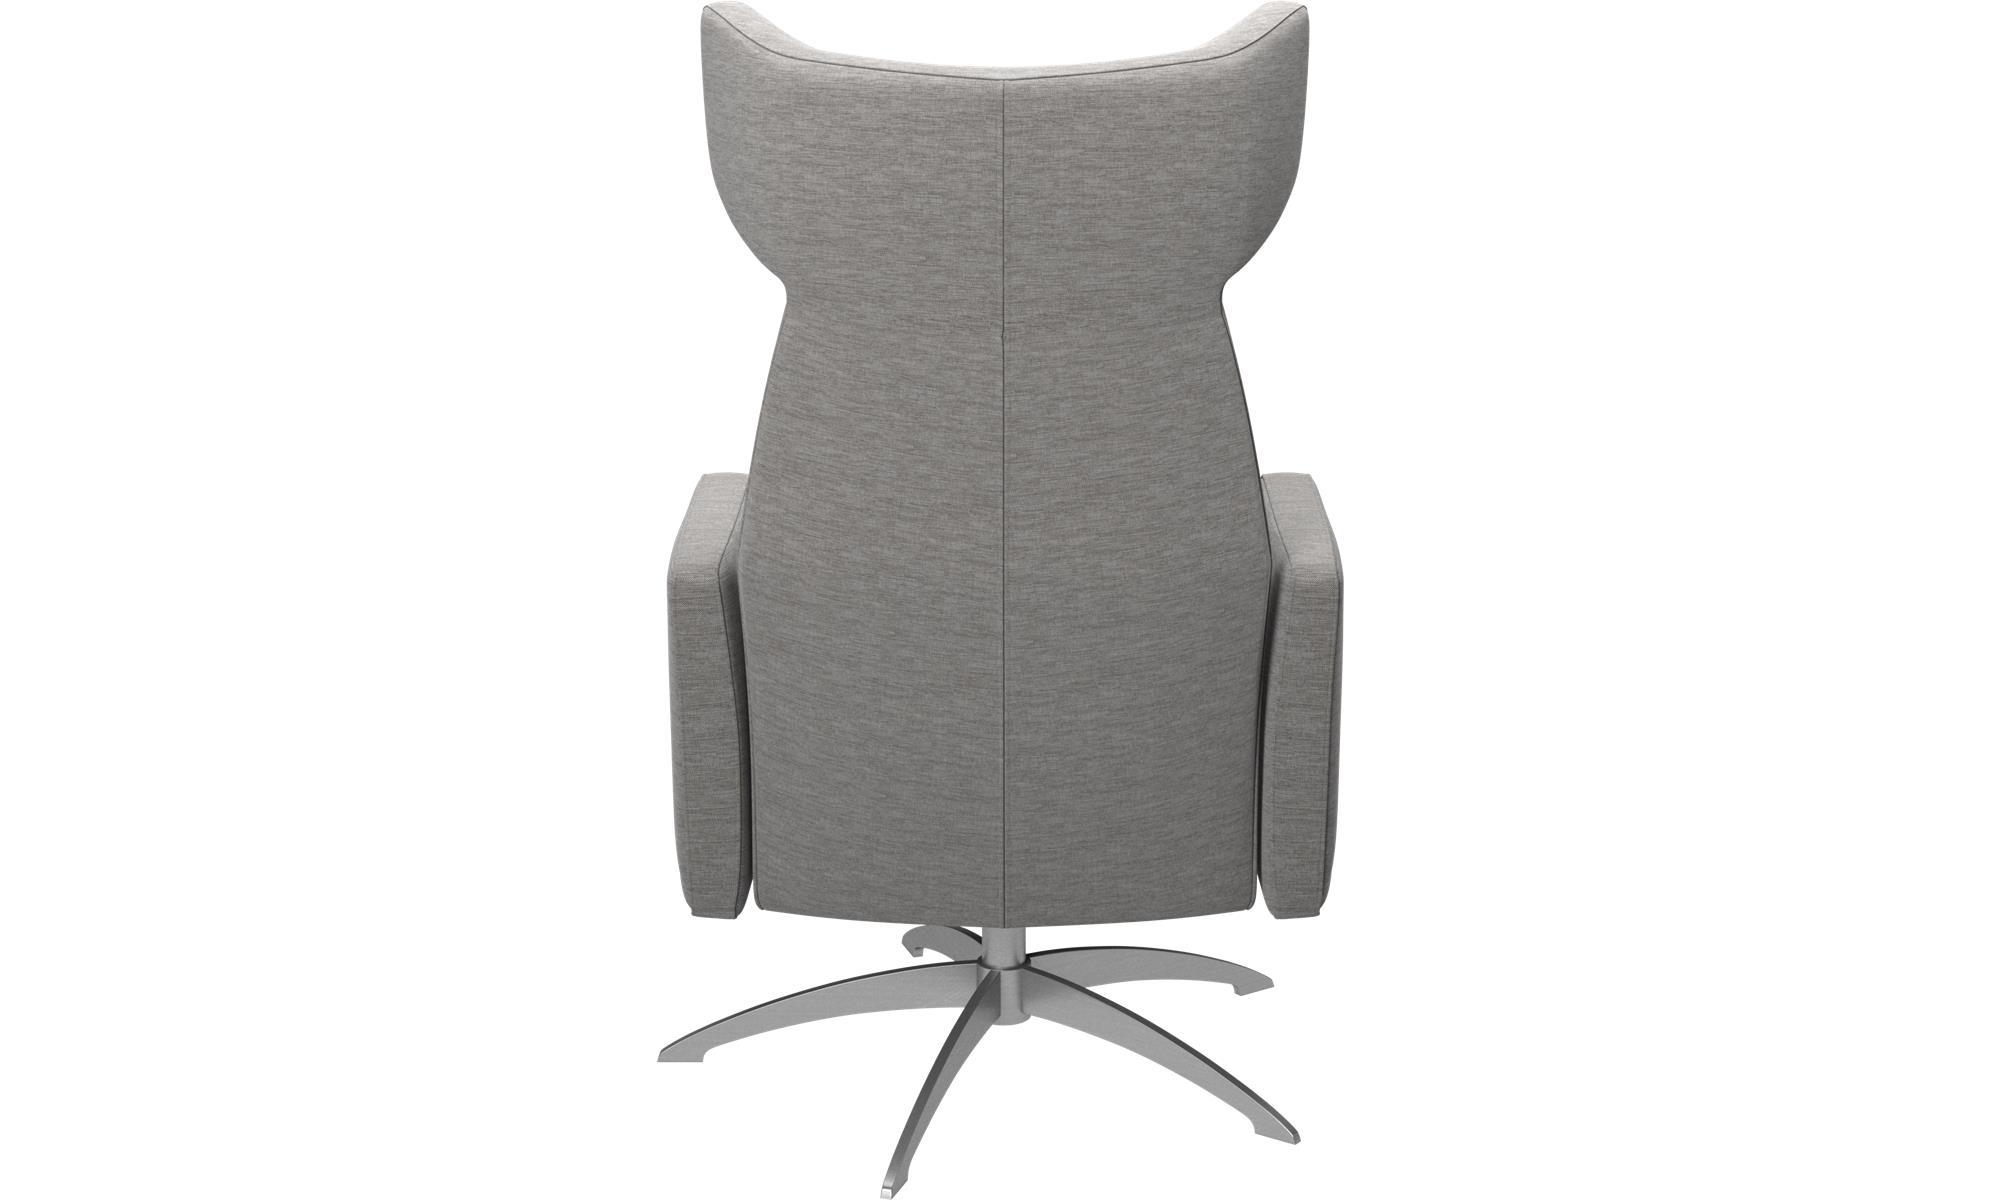 sessel harvard elektrisch verstellbarer sessel auch als manuell verstellbare. Black Bedroom Furniture Sets. Home Design Ideas